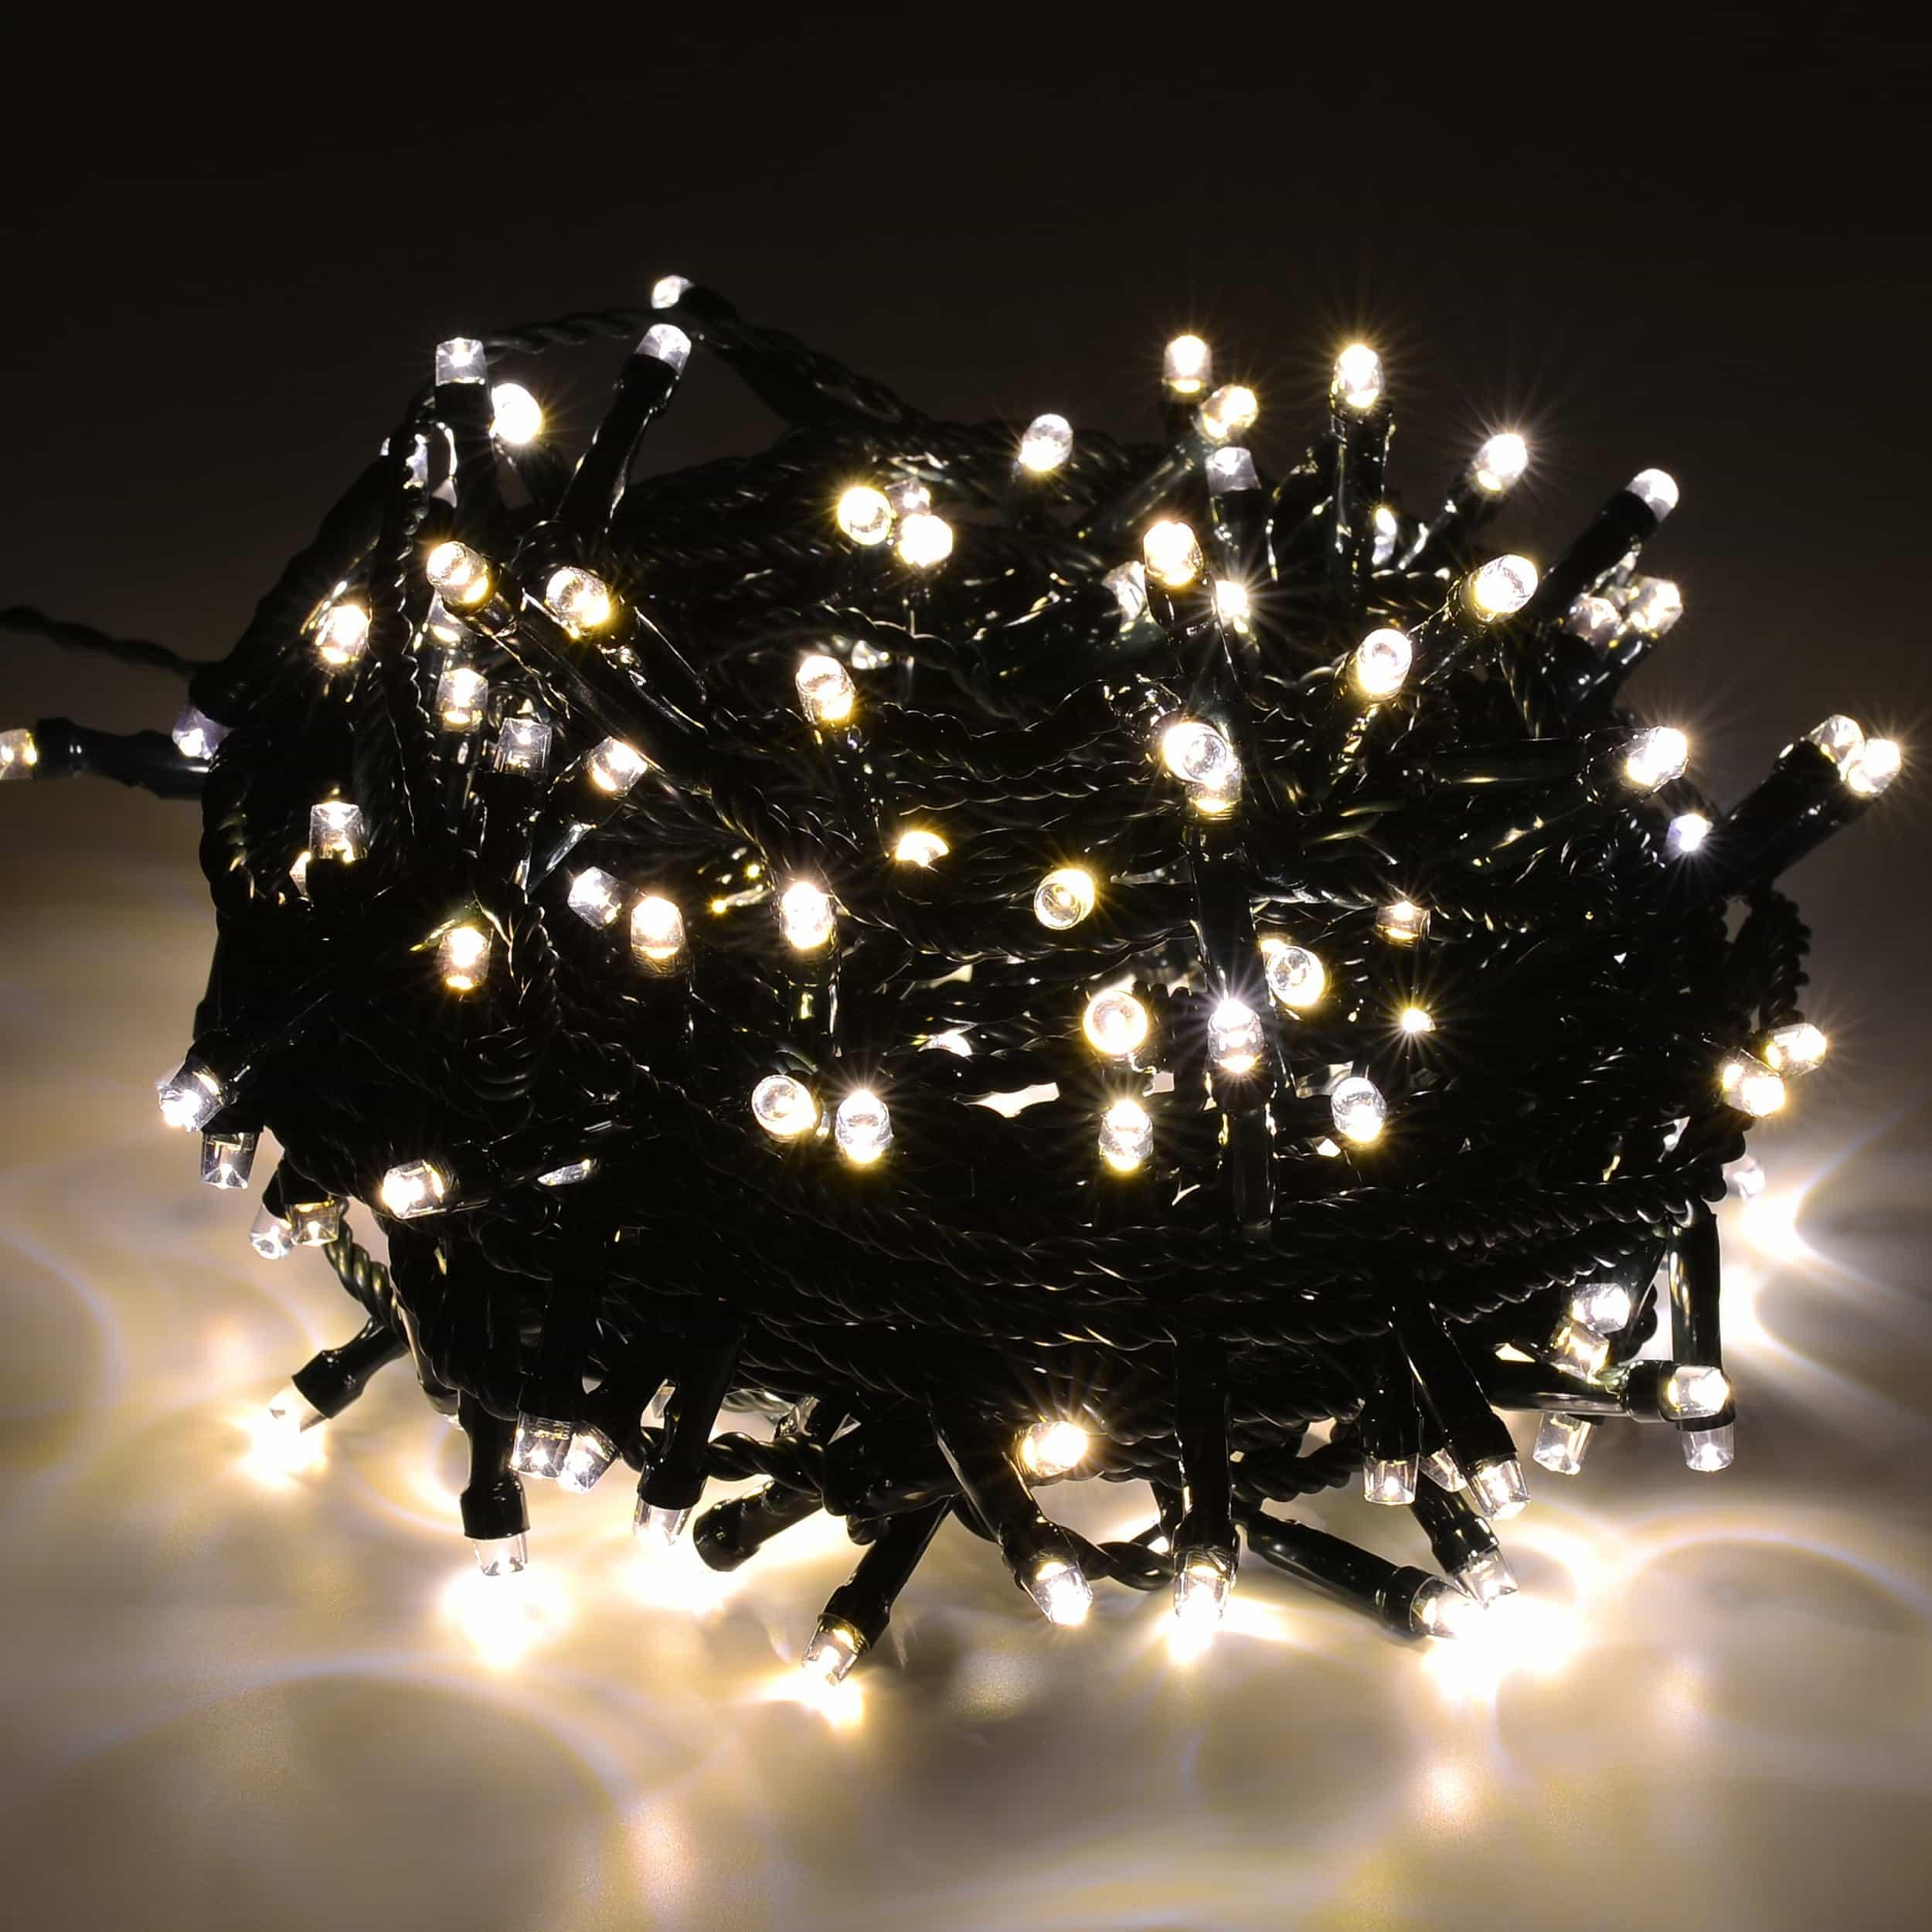 LED Lichterkette 600 LED energiesparend L30m warmweiß